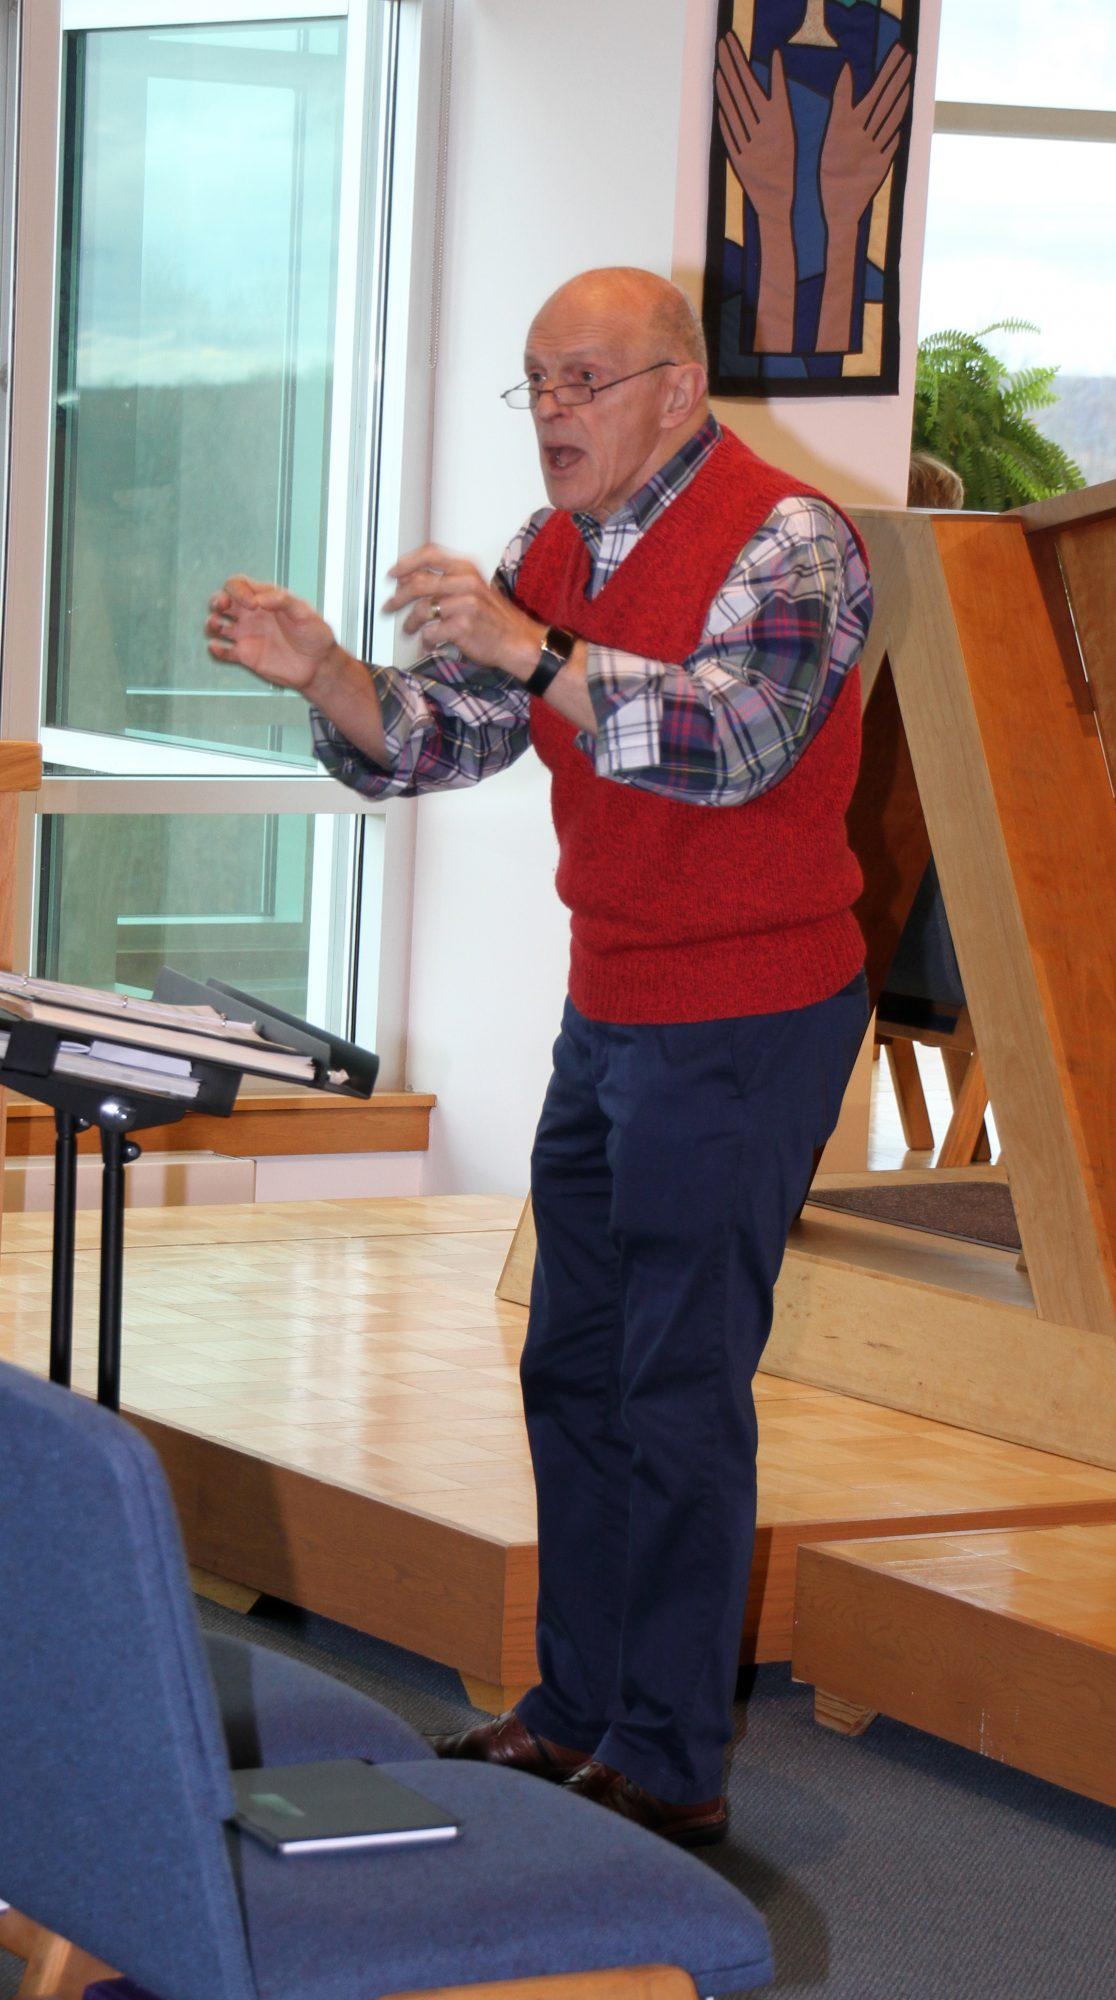 ST. ANDREWS PRESBYTERIAN CHURCH - Bob Nelson, Choir Director